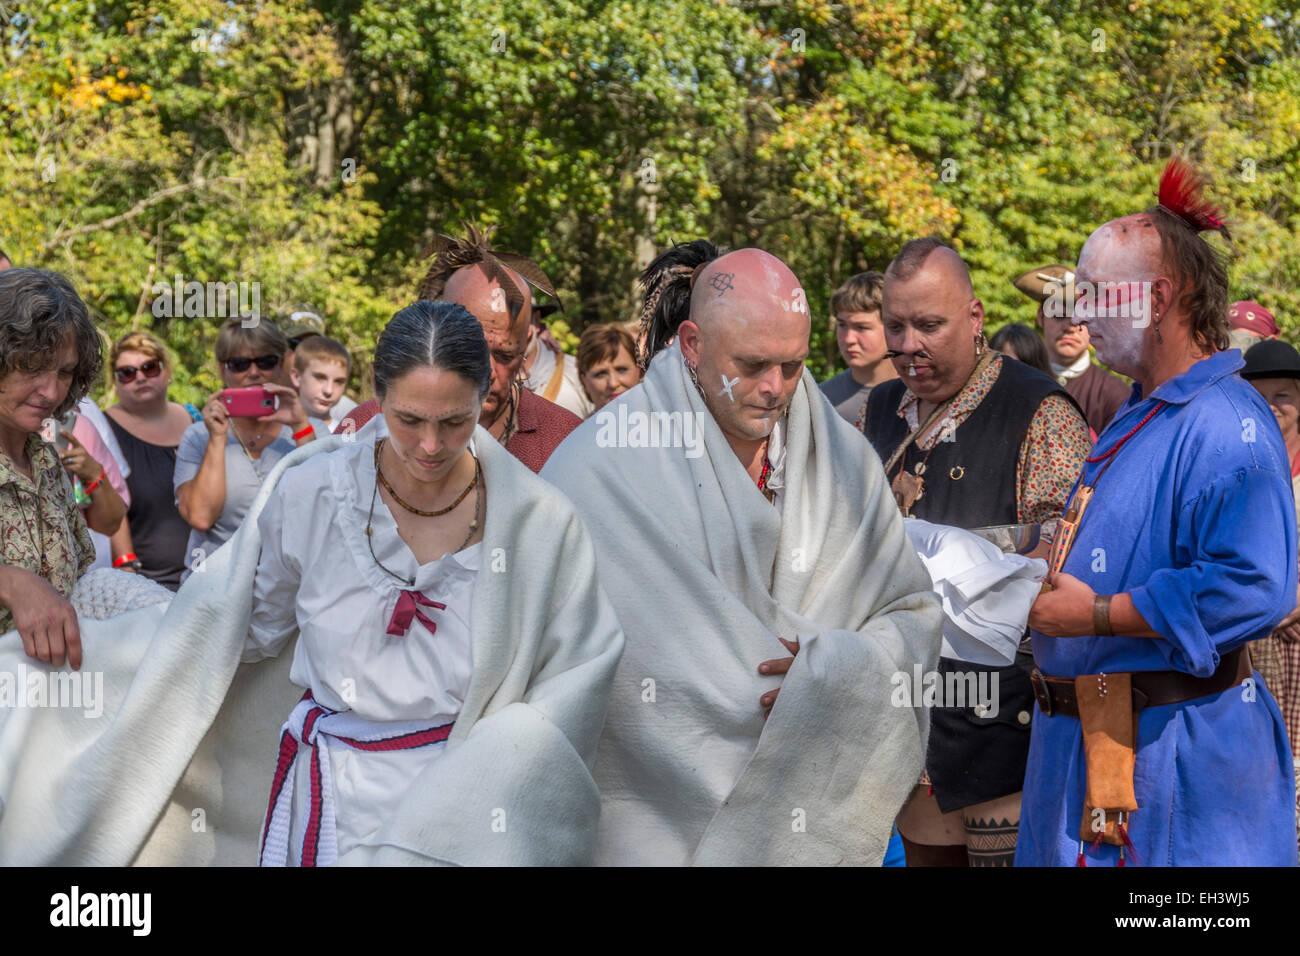 Native American Wedding.Traditional Cherokee Native American Wedding Ceremony Conducted At